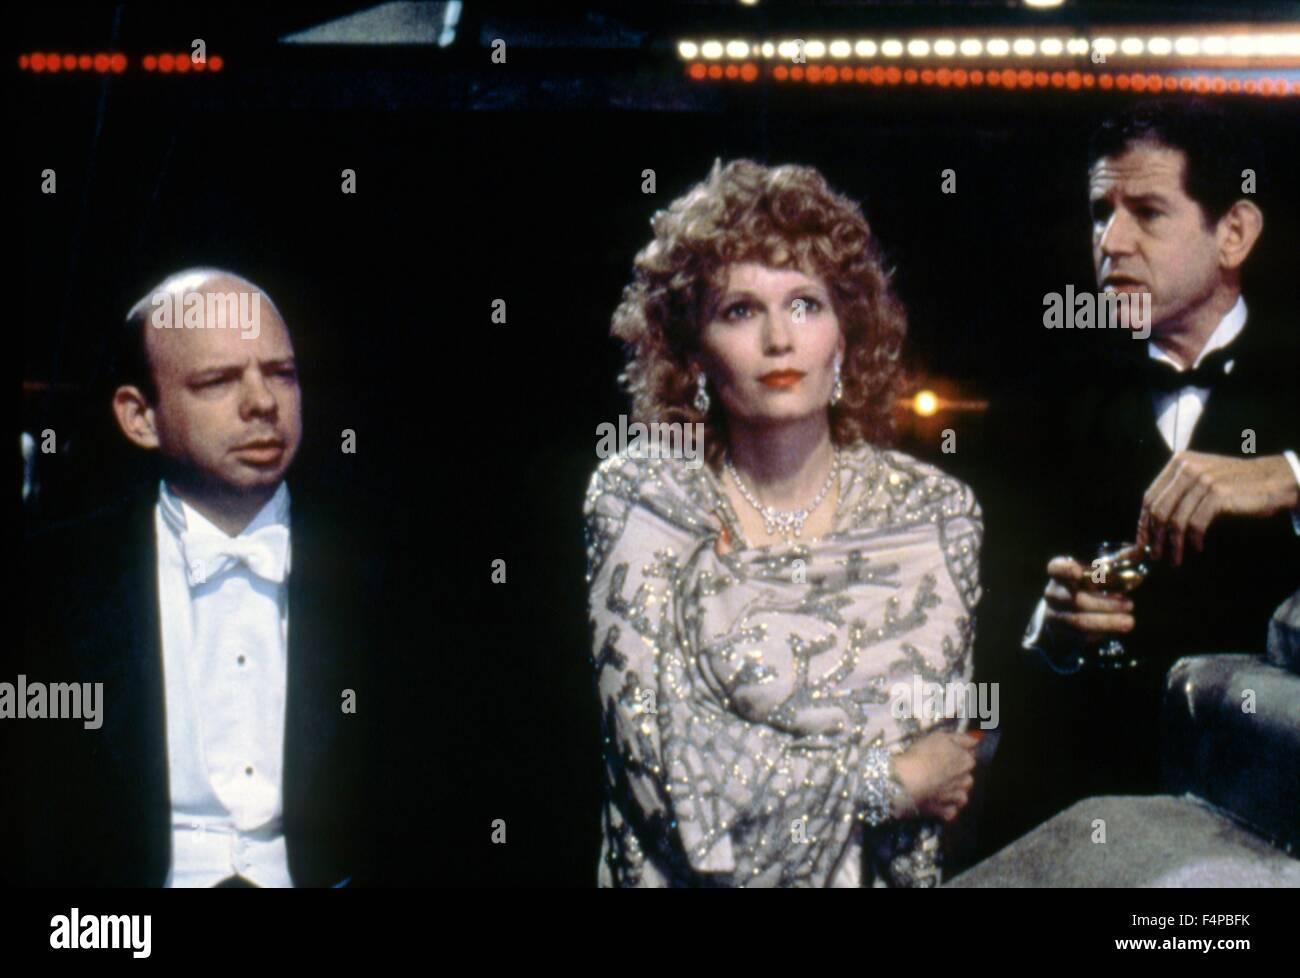 Mia Farrow, Tony Roberts / Radio Days 1987 directed by Woody Allen - Stock Image